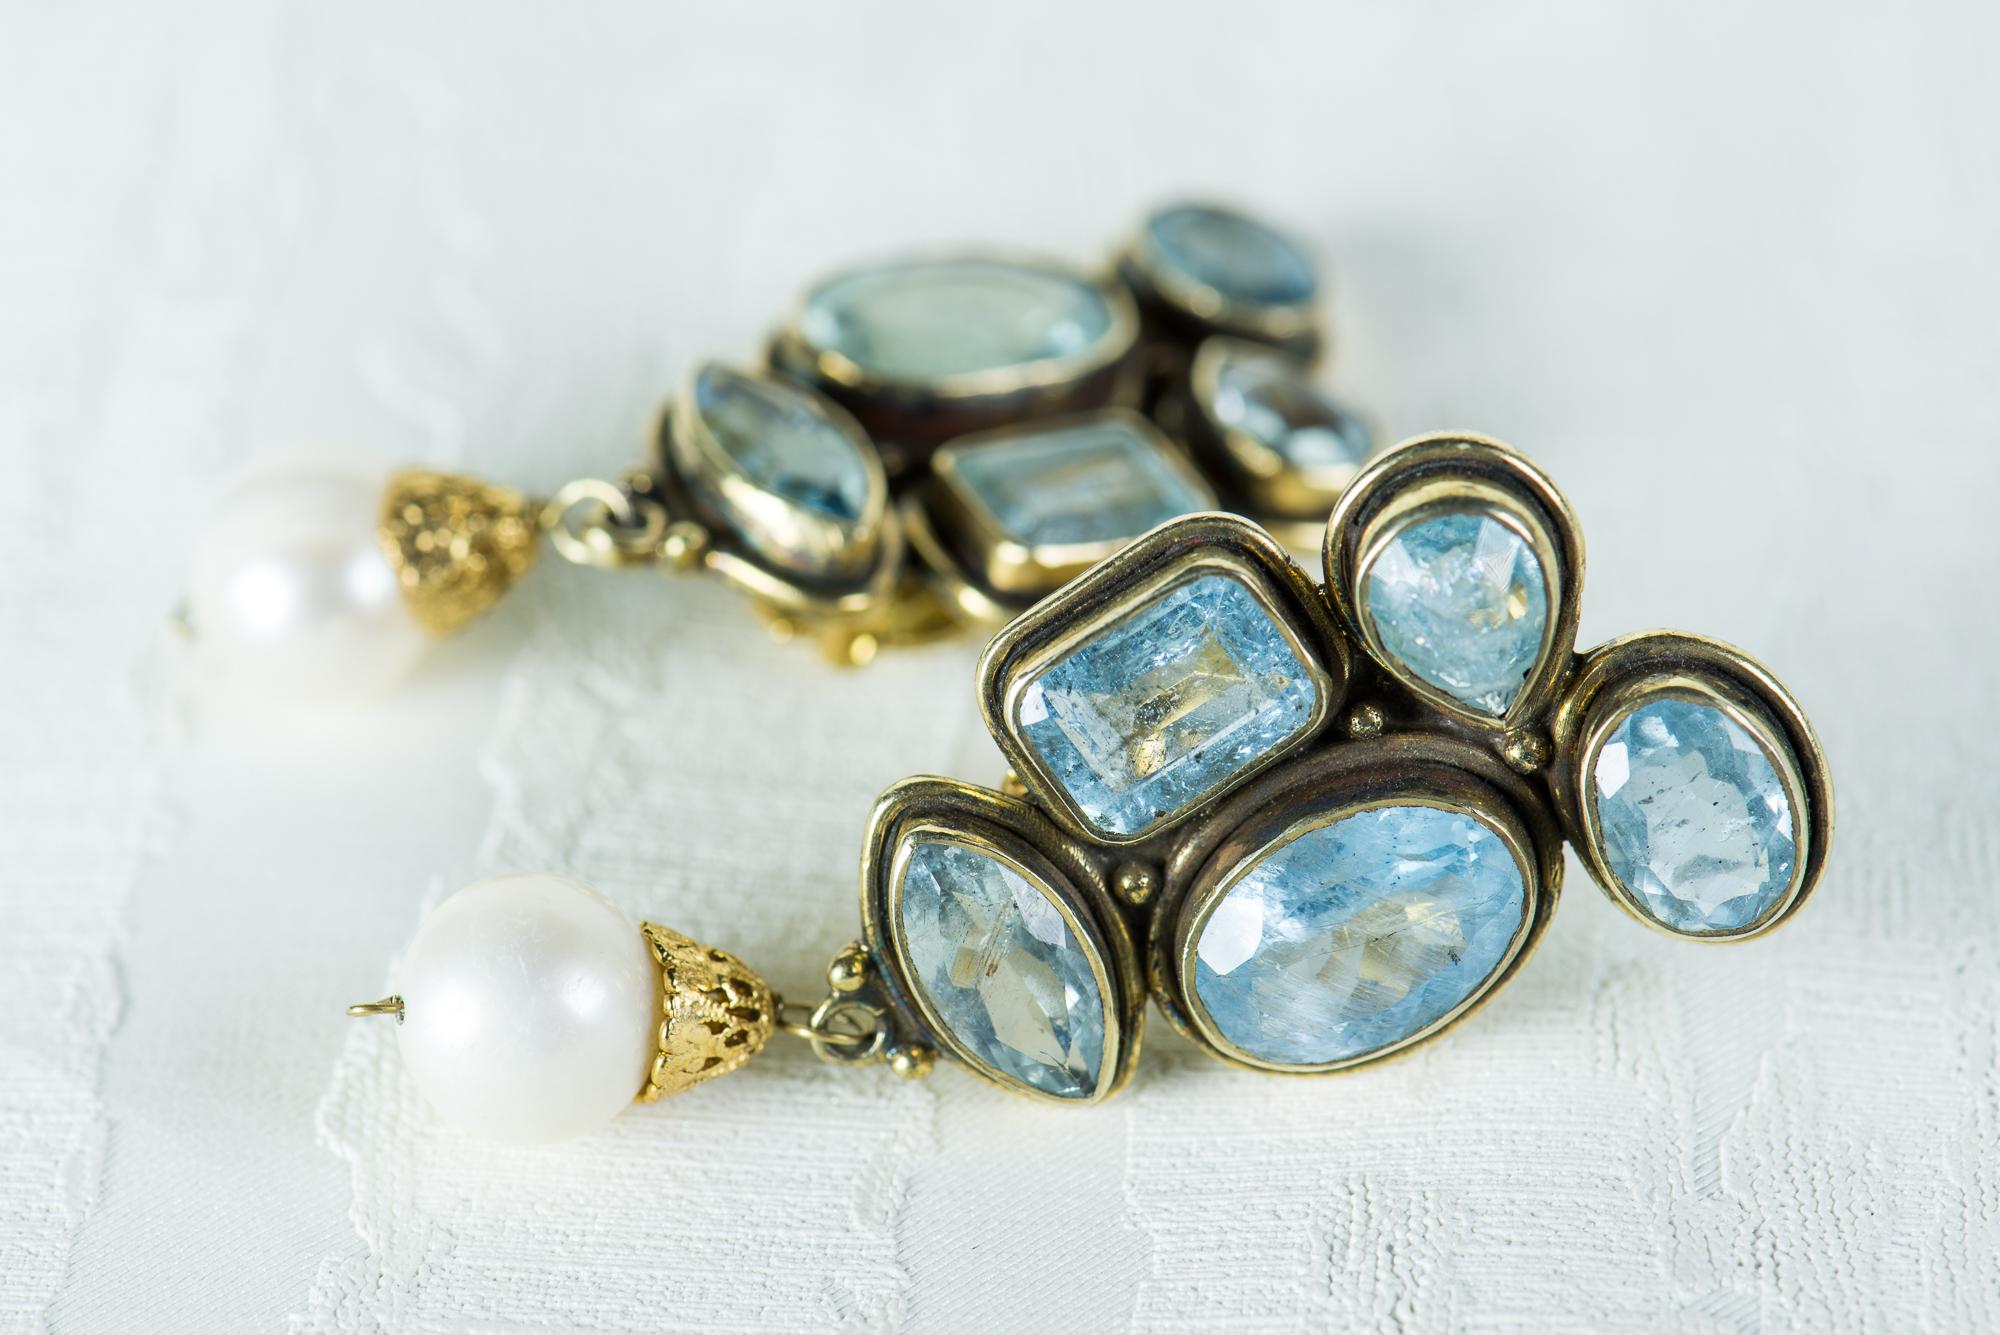 Pendientes eli clip perla l pez linares for Lin s jewelry agana guam